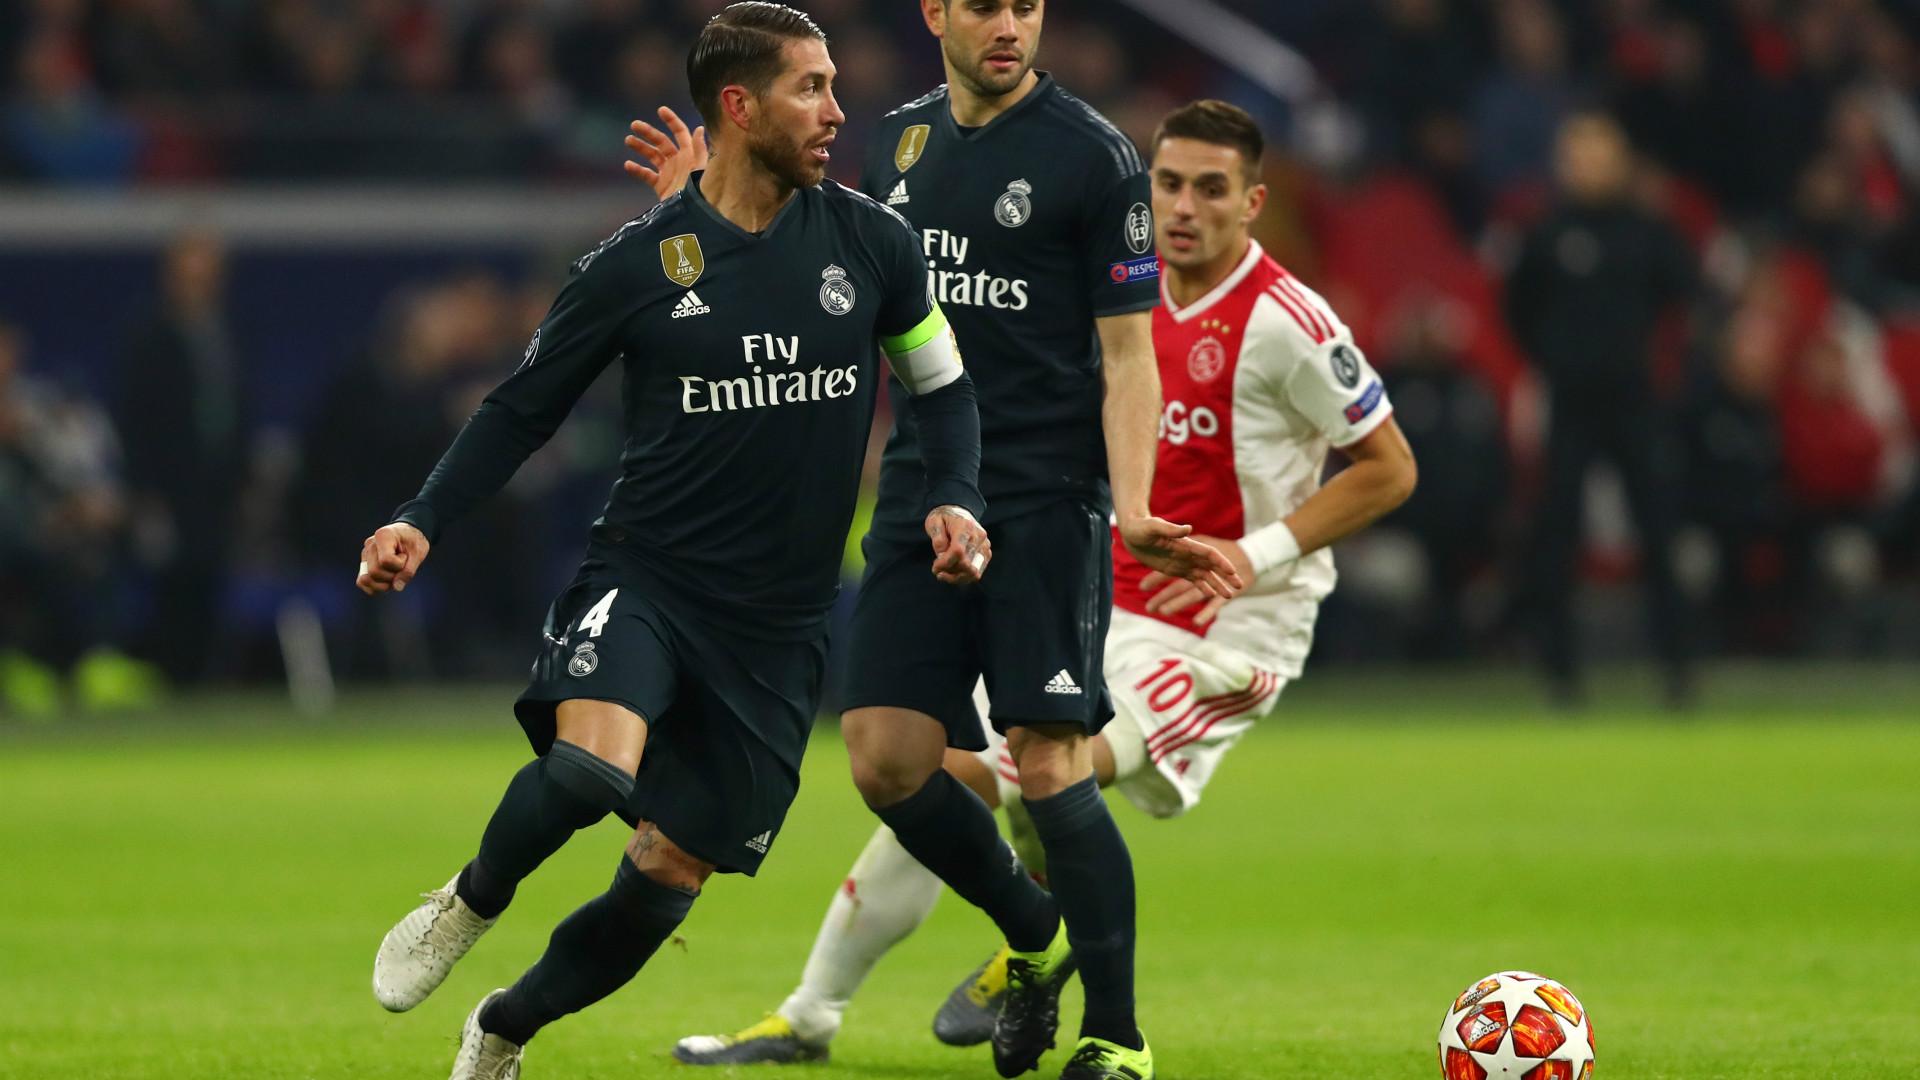 RAMOS AJAX REAL MADRID CHAMPIONS LEAGUE